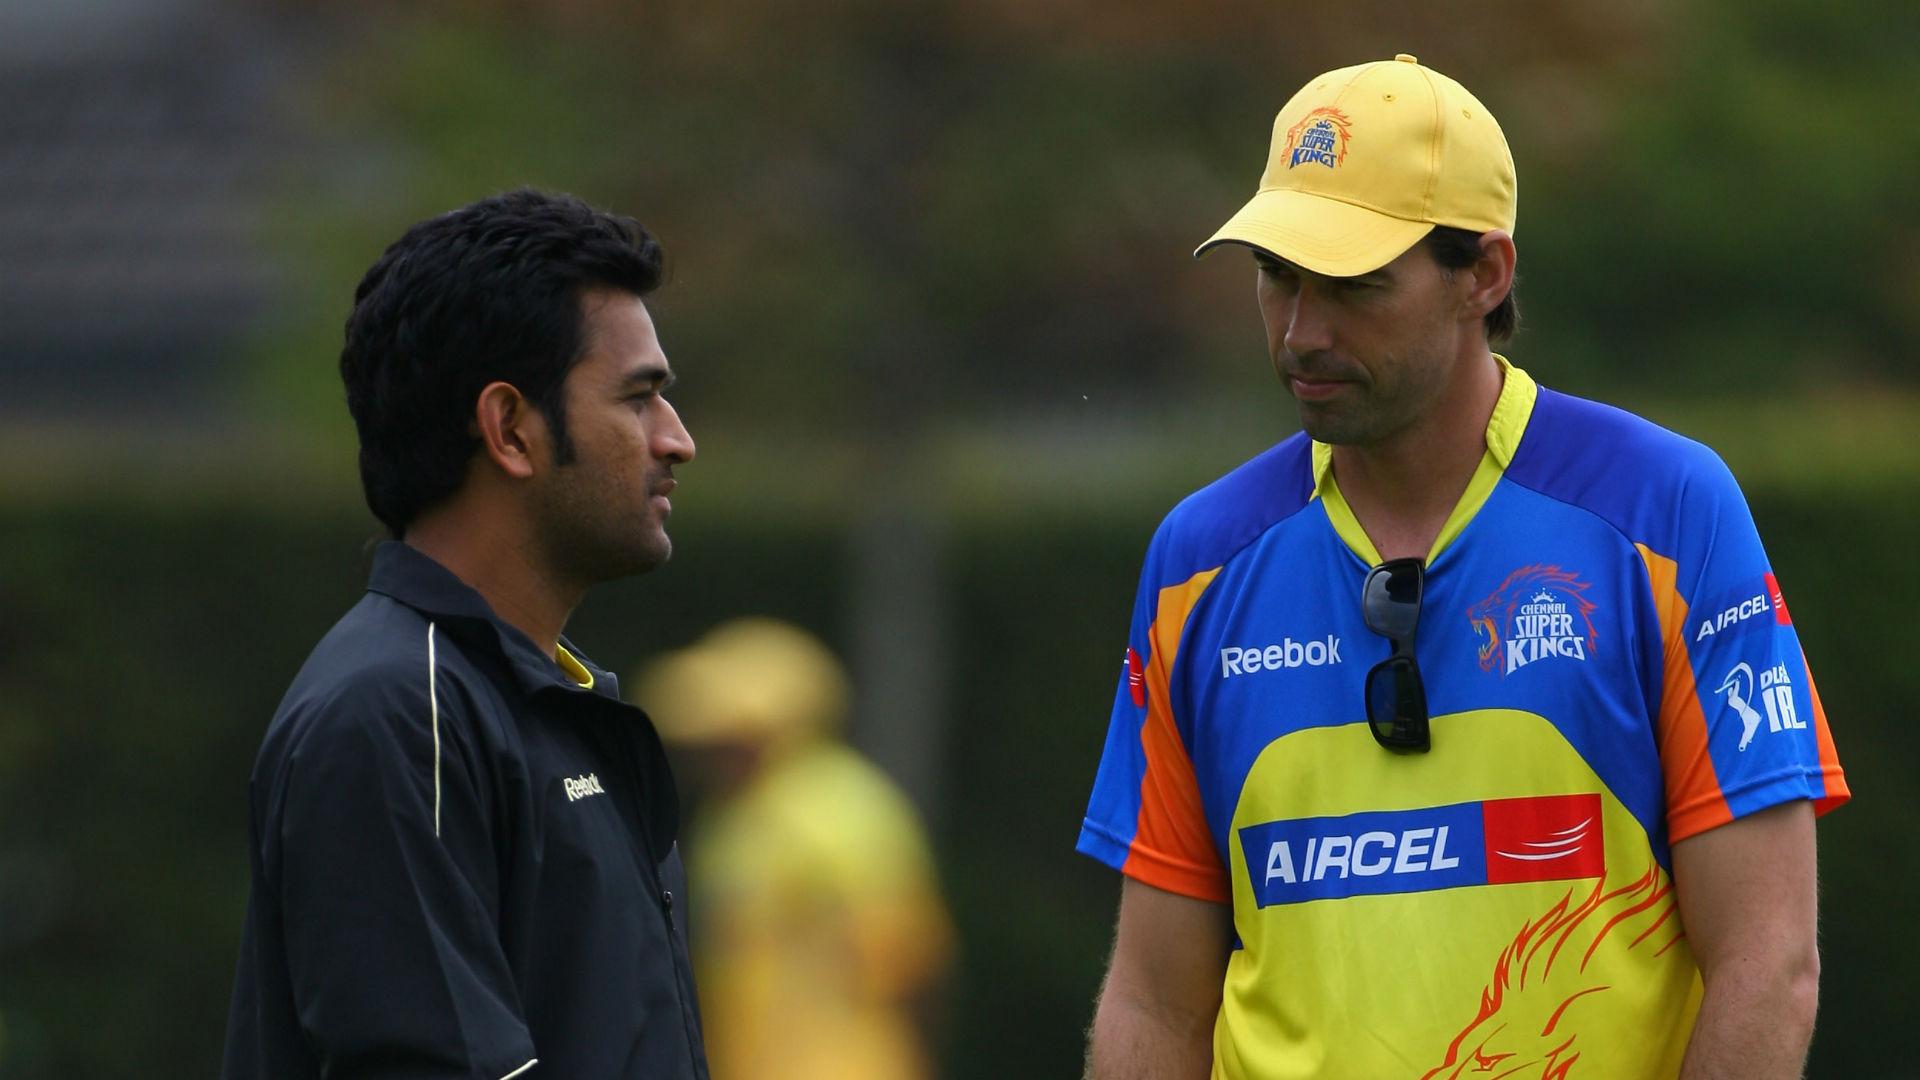 Super Kings calm despite chaotic IPL build-up